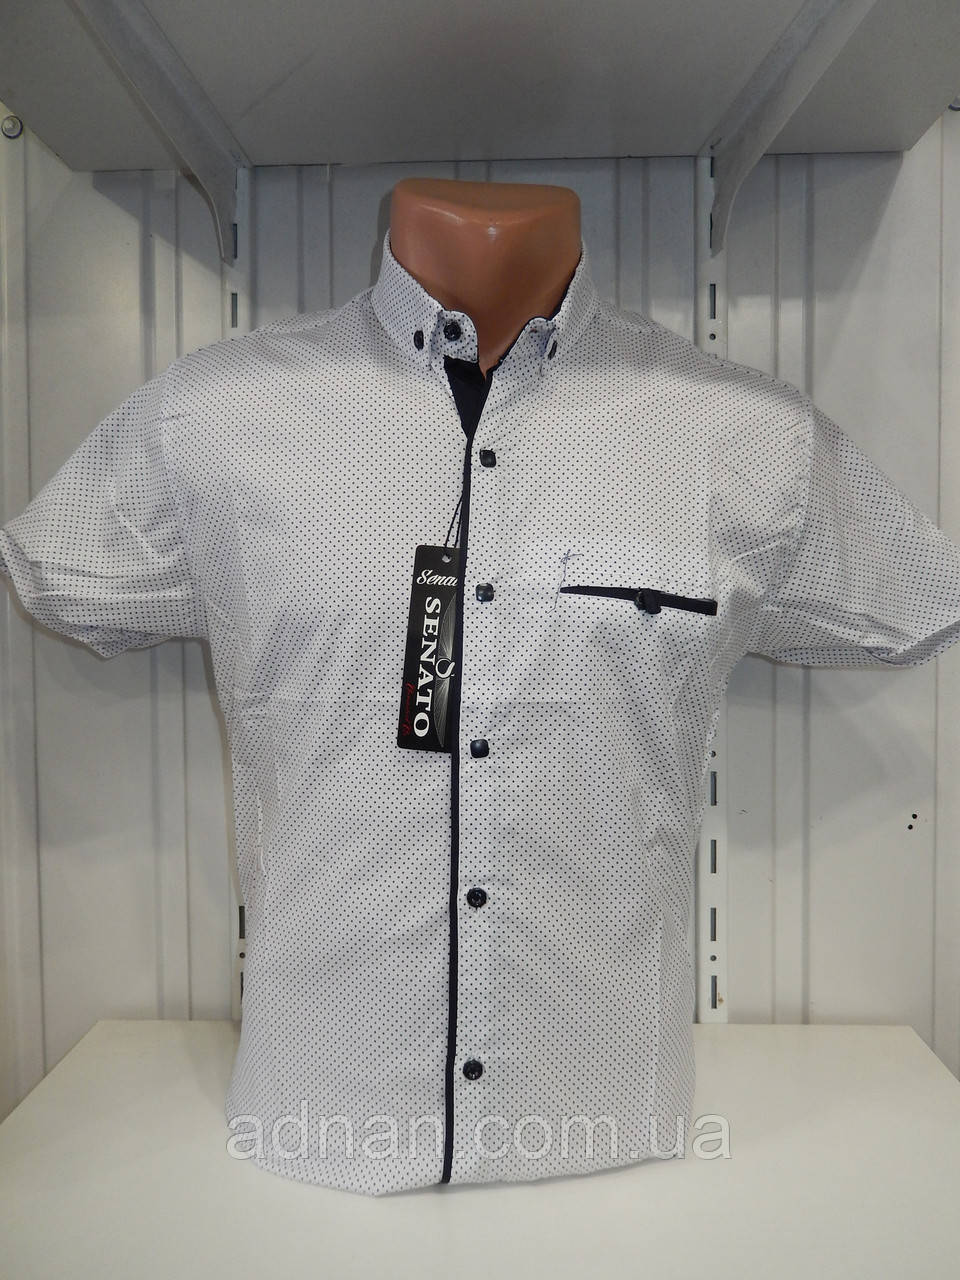 Рубашка мужская SENATO короткий рукав, узор, стрейч котон 18.06 007 \ купить рубашку оптом.